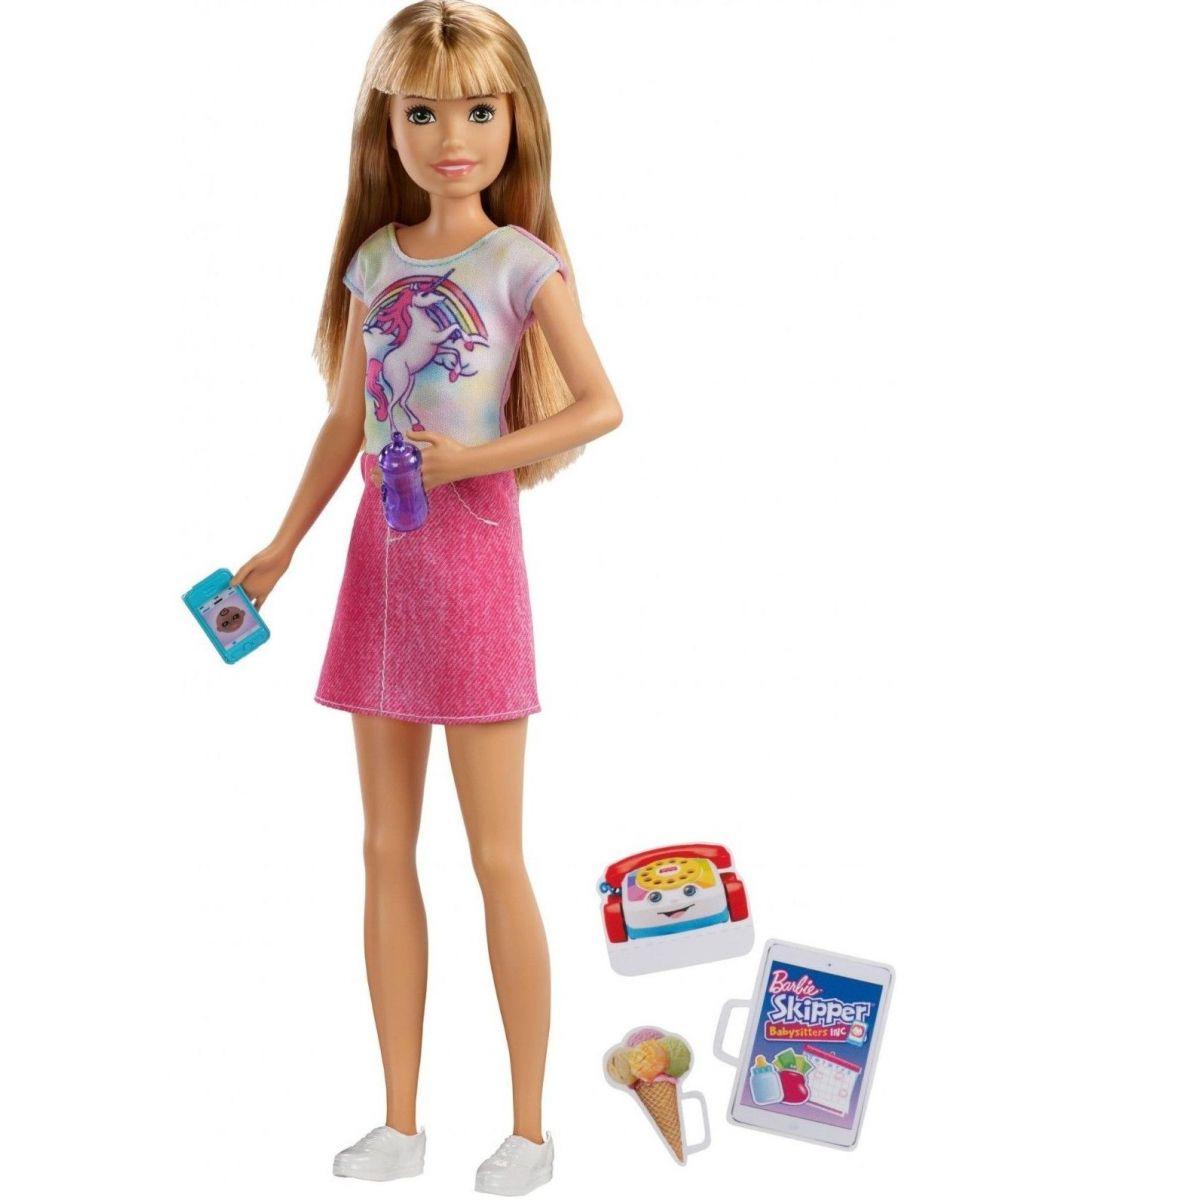 Mattel Barbie Chůva blondýnka v růžových šatech s jednorožcem